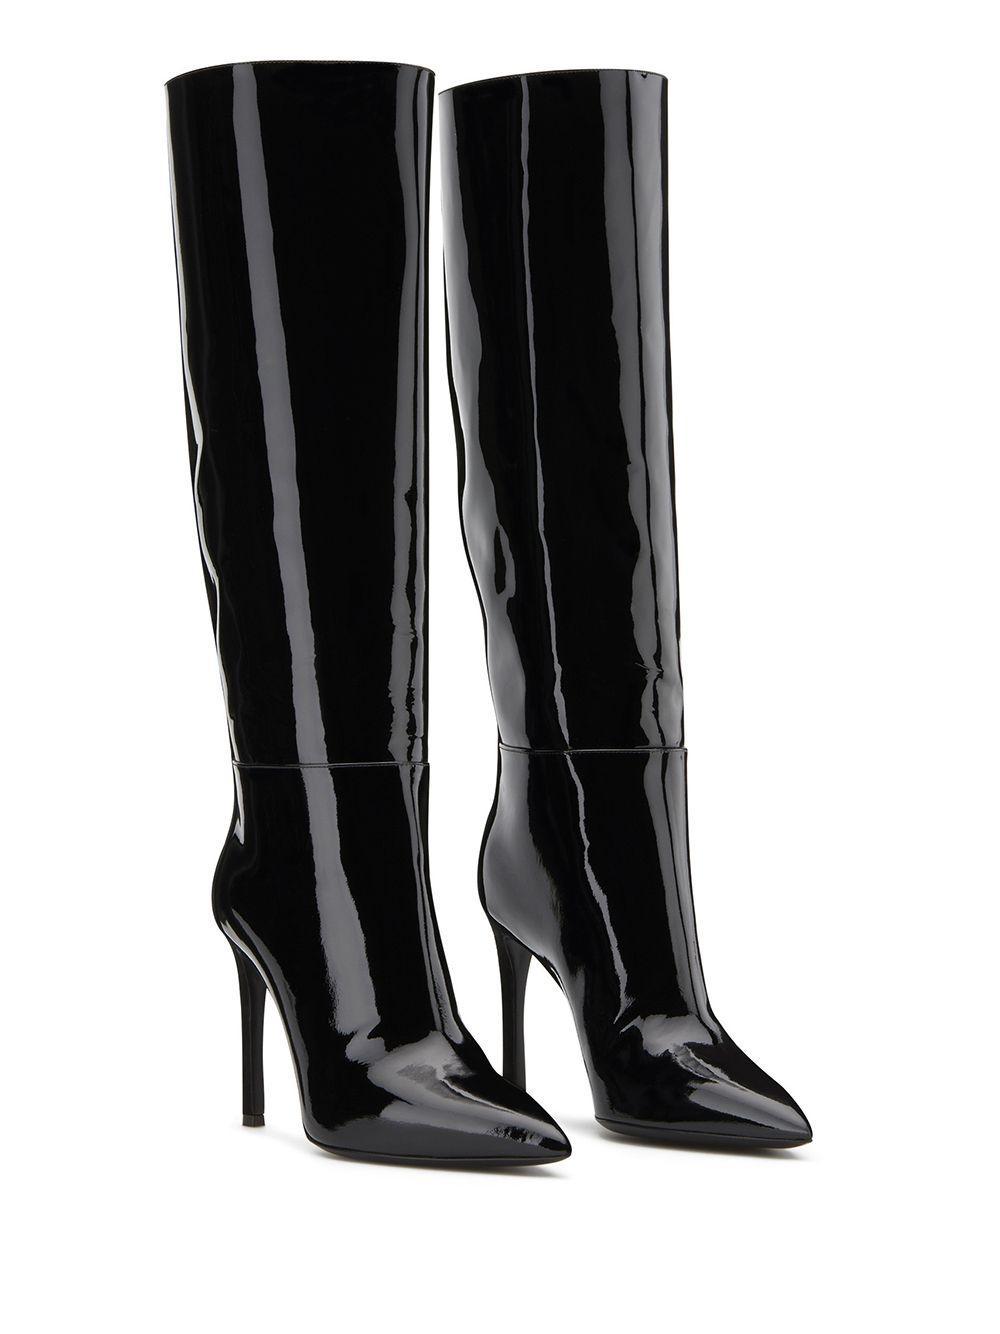 Botas altas Giuseppe Zanotti de Cuero de color Negro